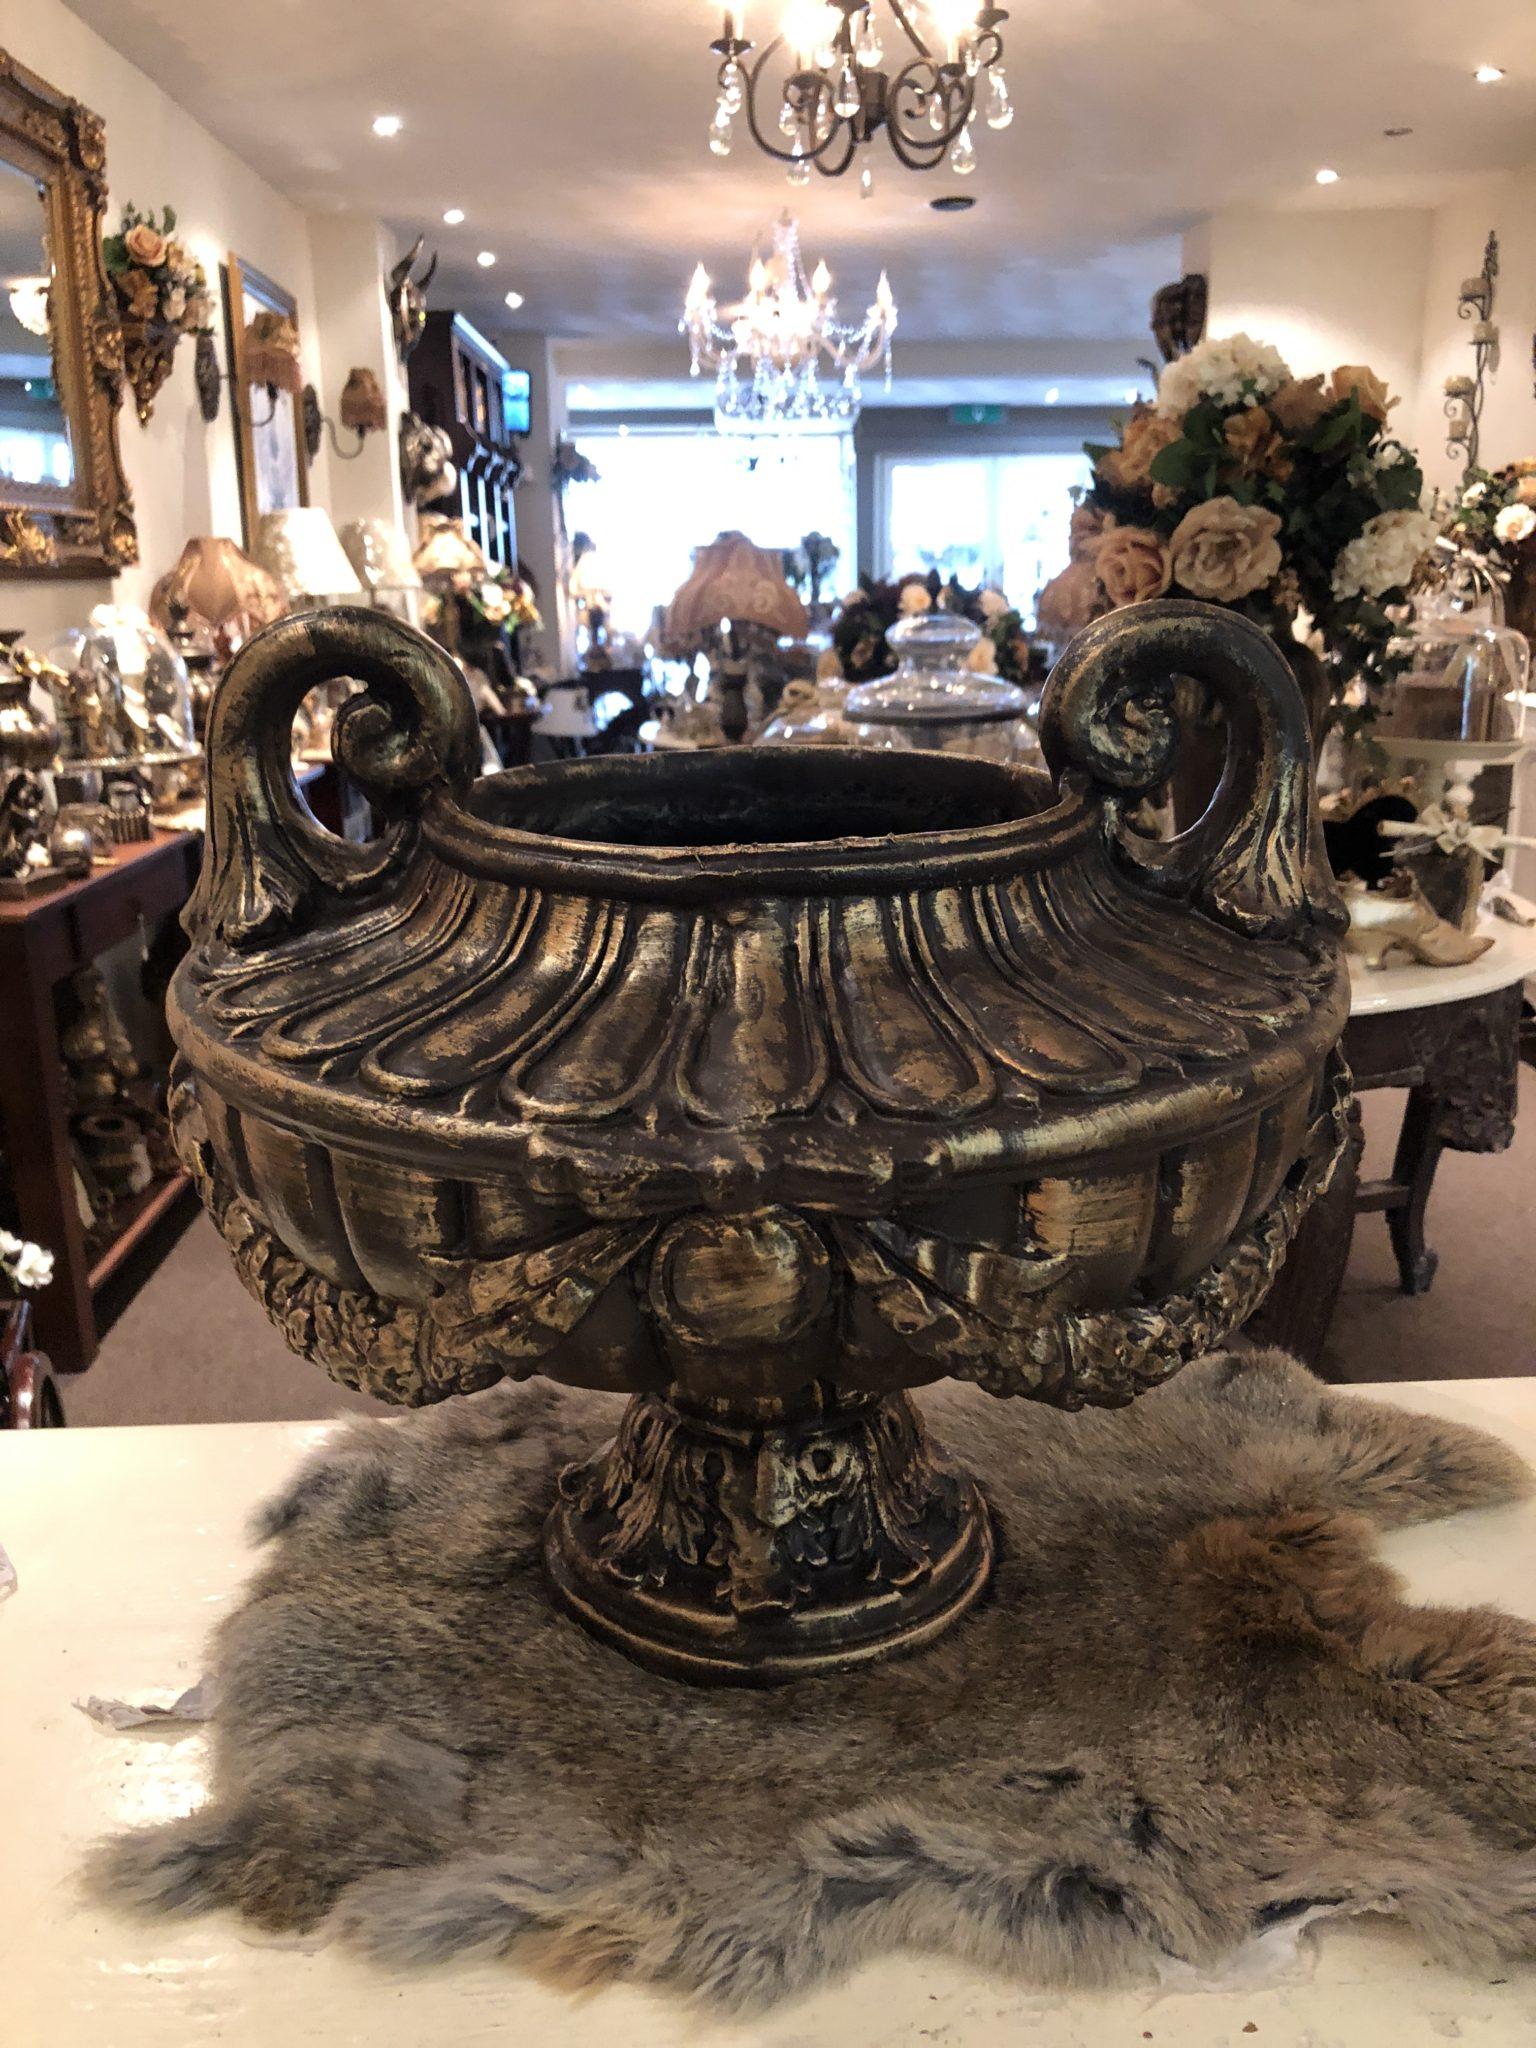 Cool grote barok with barok fotolijst groot with barok for Barok spiegel groot